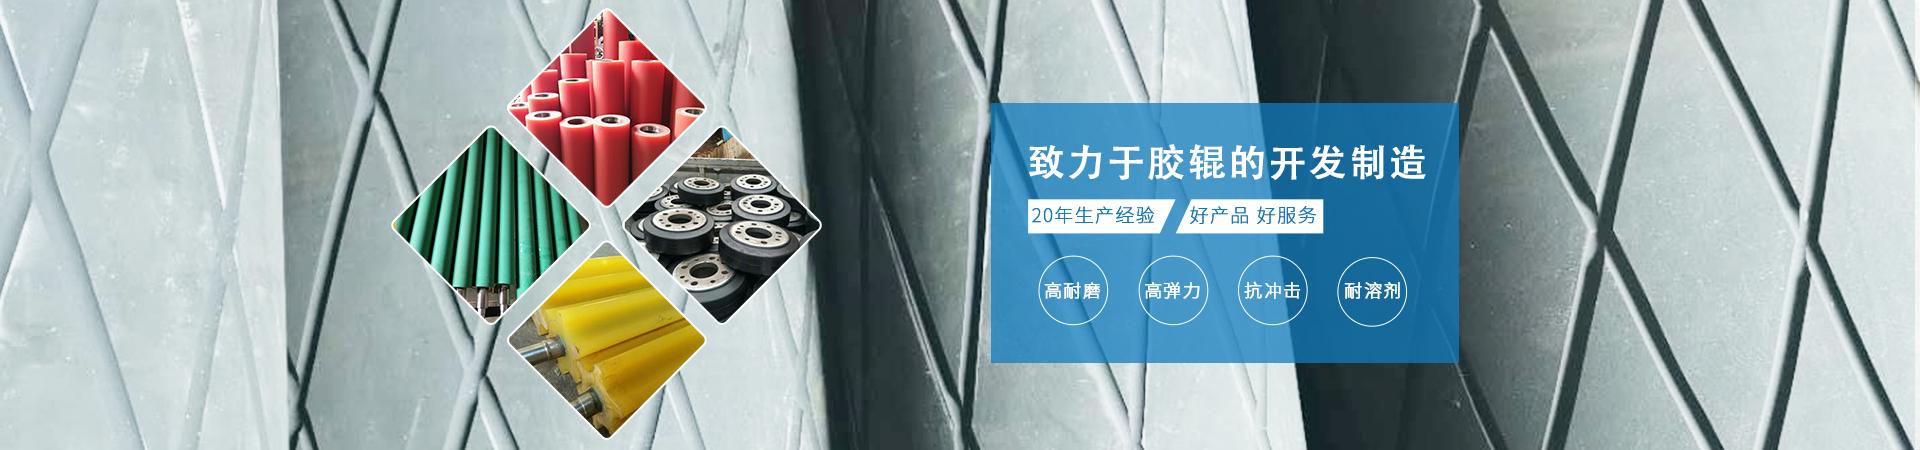 http://www.ytjiaogun.cn/data/upload/202008/20200819114927_761.jpg